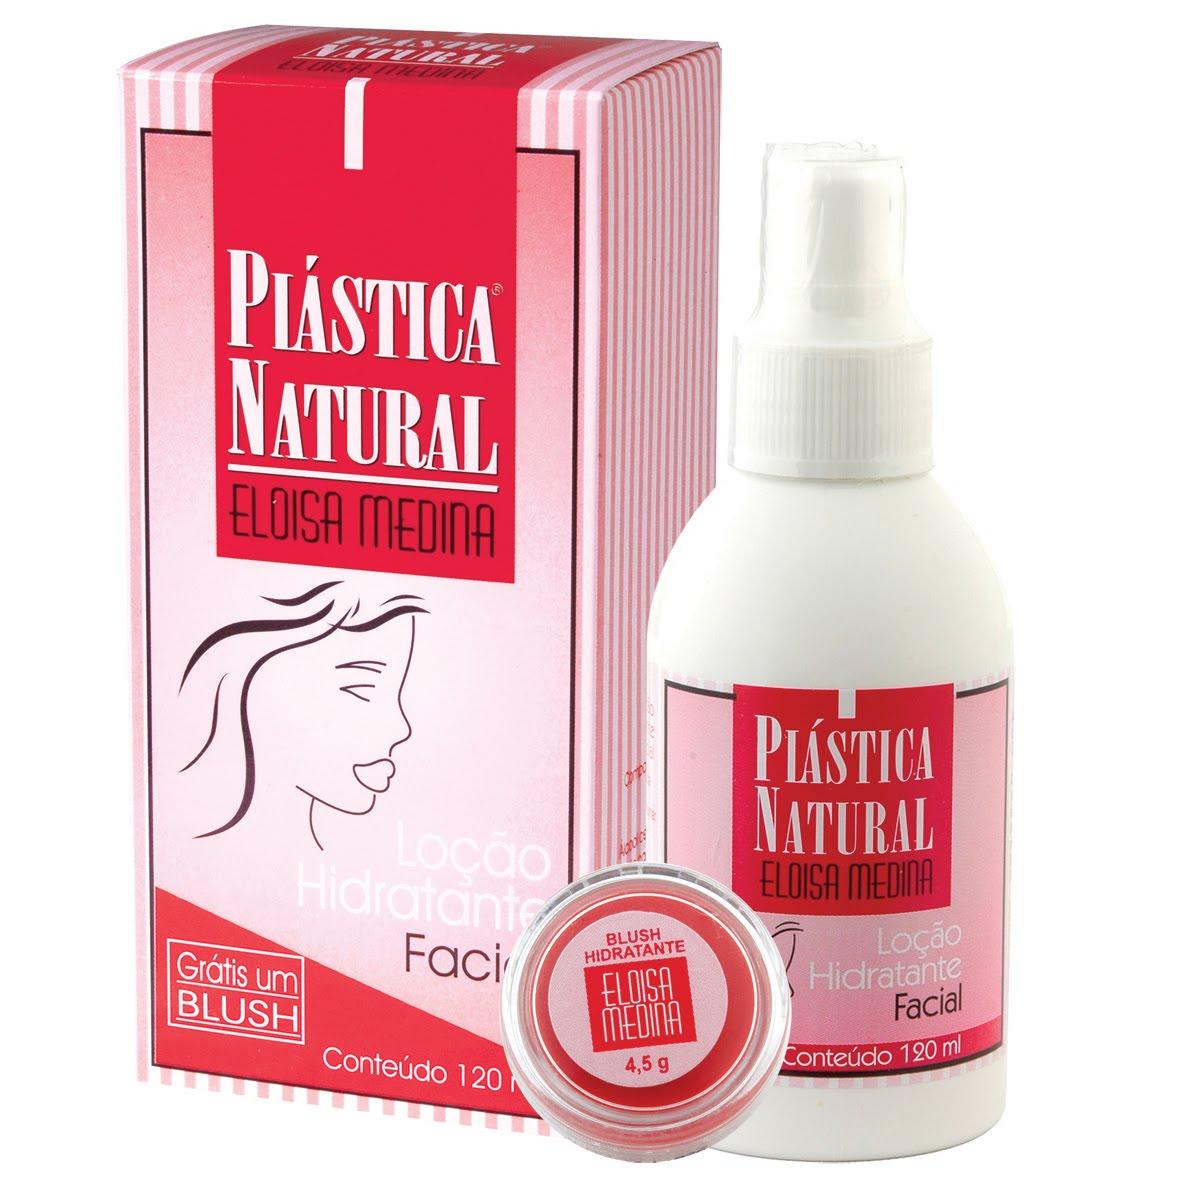 kit plastica natural eloísa medina Kit Plástica Natural da Eloísa Medina